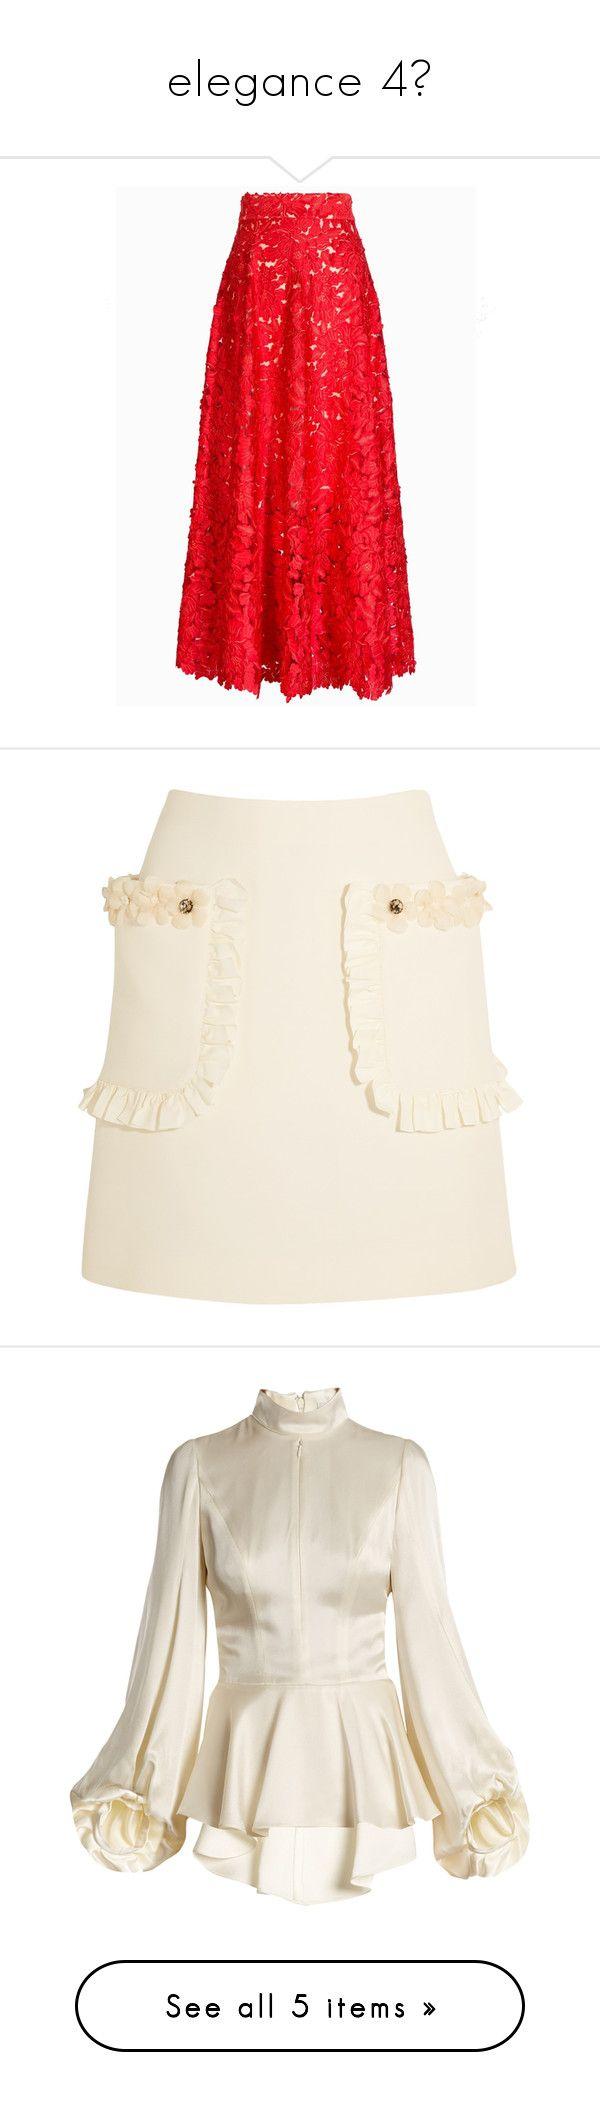 """elegance 4💃"" by krystalyuke ❤ liked on Polyvore featuring skirts, fold-over maxi skirt, foldover skirts, floral knee length skirt, floral skirt, fold-over skirts, mini skirts, bottoms, fendi and short floral skirt"